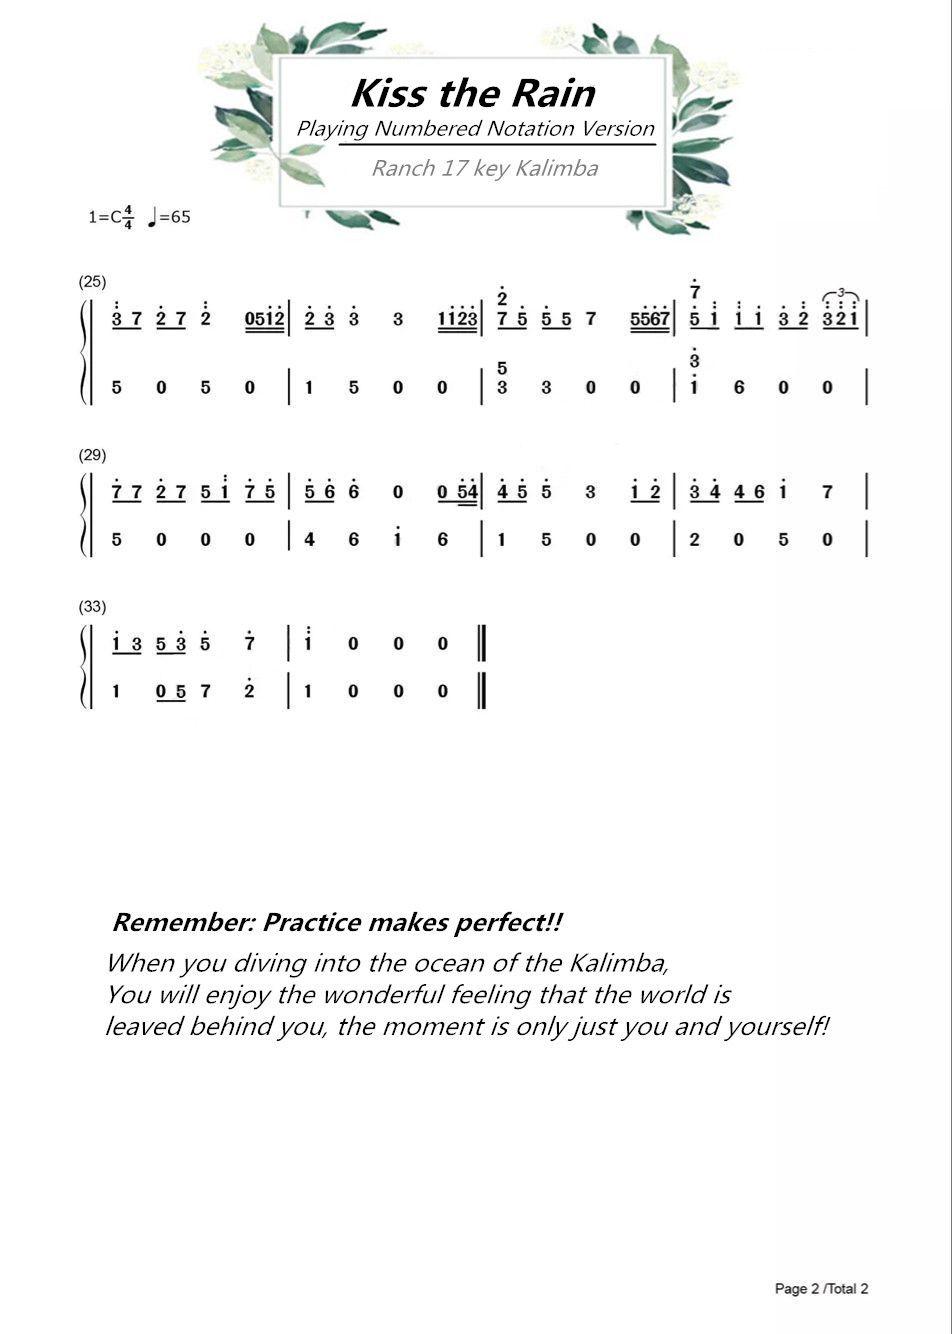 Ranch Beginners 17 Key Kalimba Lesson 4 Kiss The Rain Piano